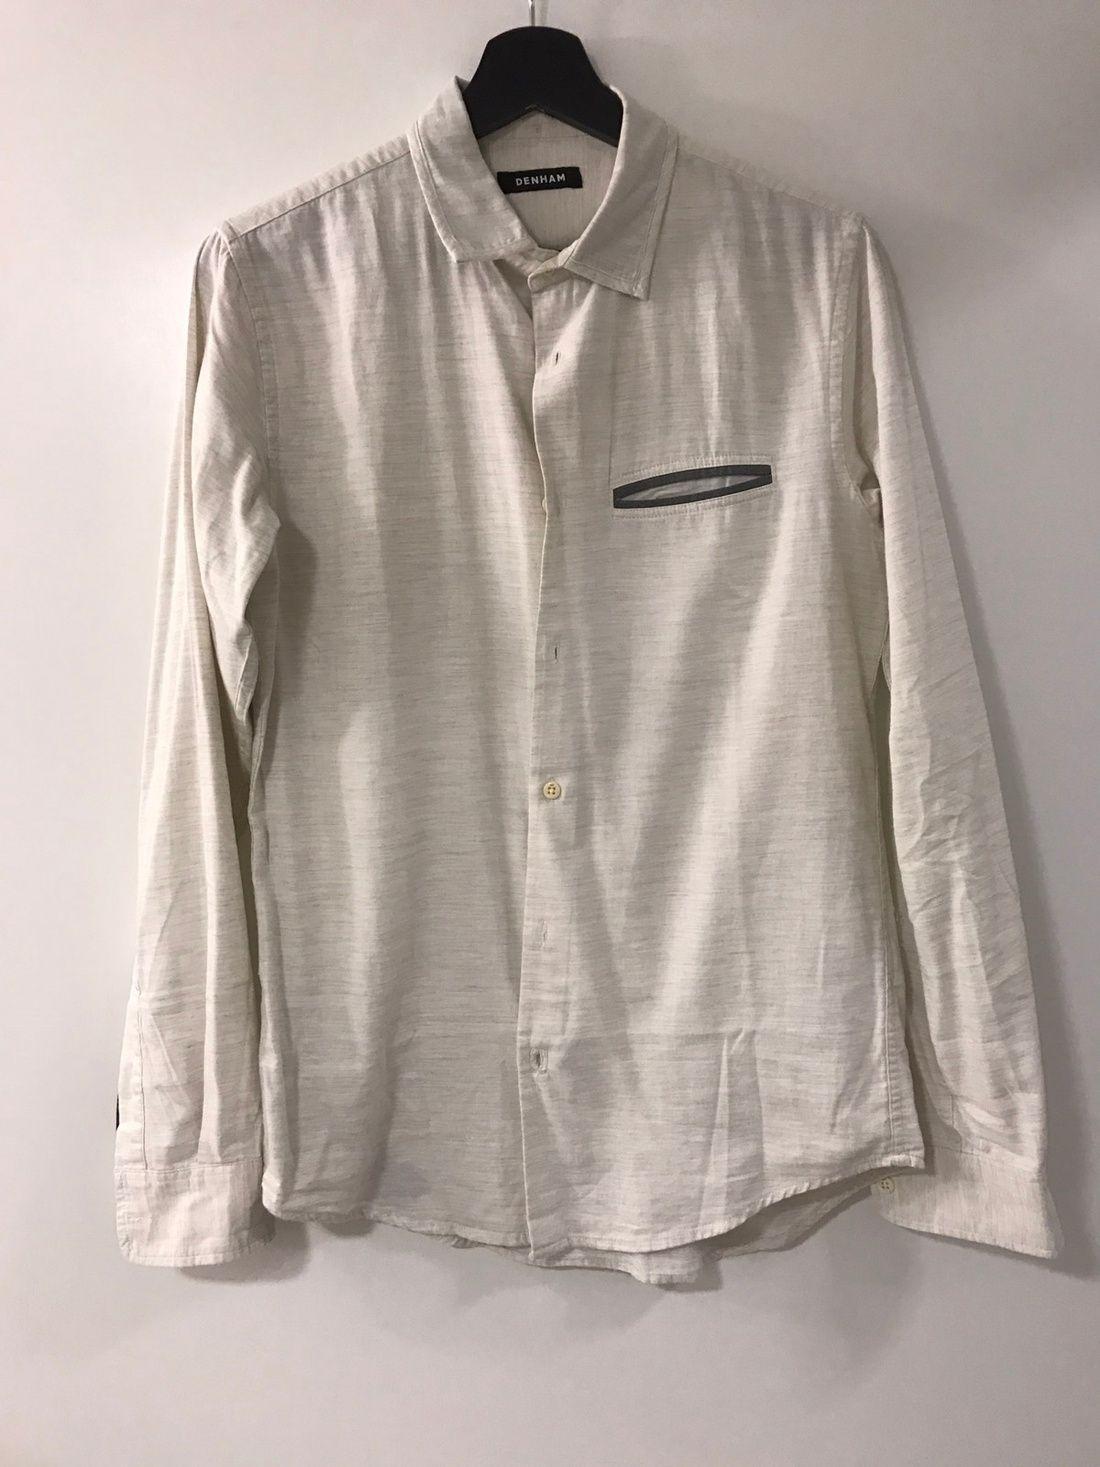 Denham Off White Button Up Shirt Size S $60 - Grailed | tops ...